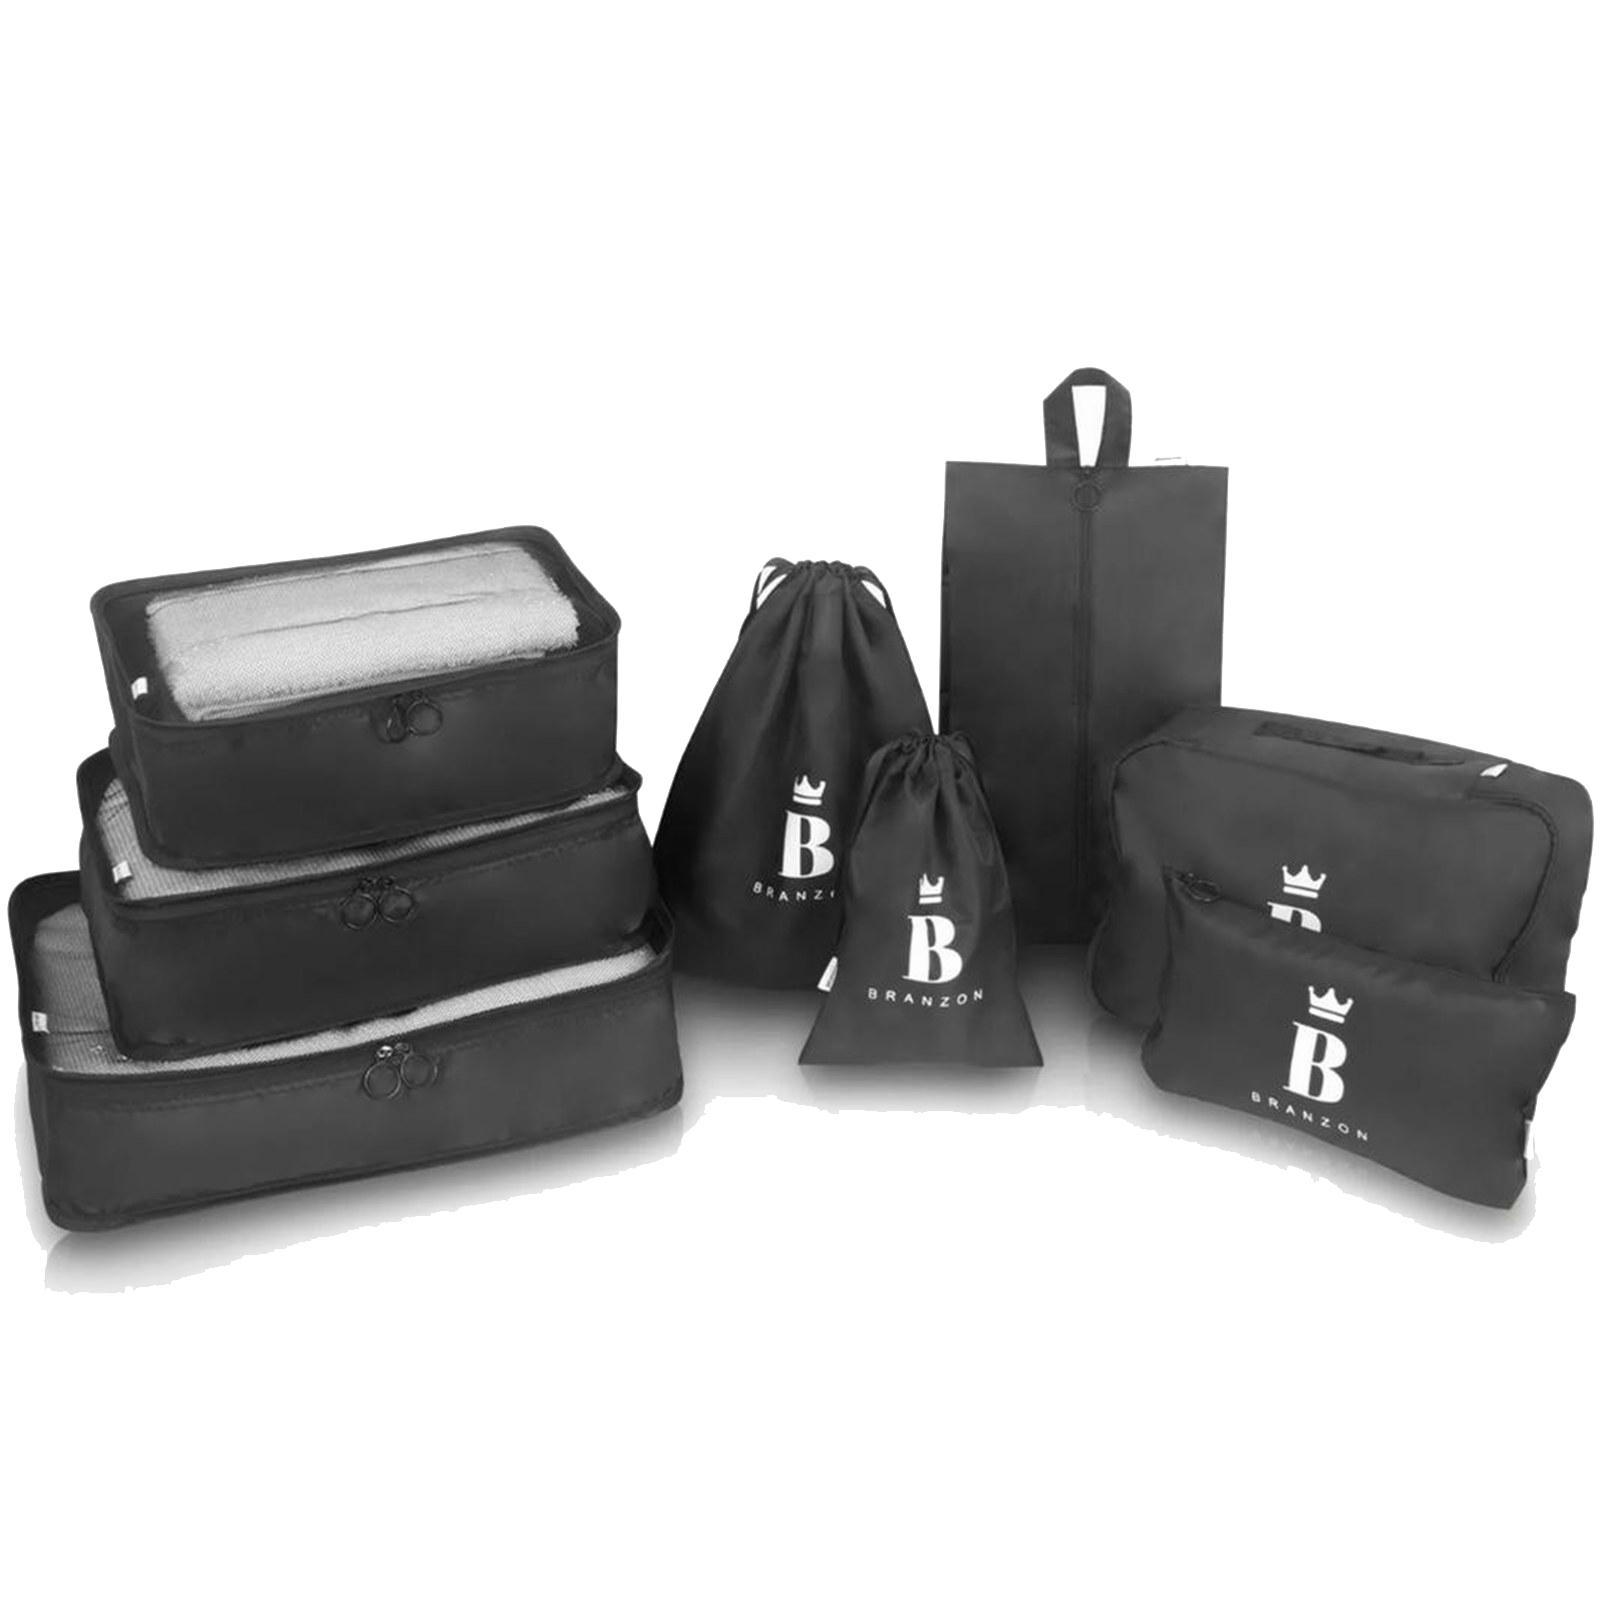 5 Sets x BRANZON 8Pcs High Quality Travel Luggage Organizer Bag Packing Cube Storage